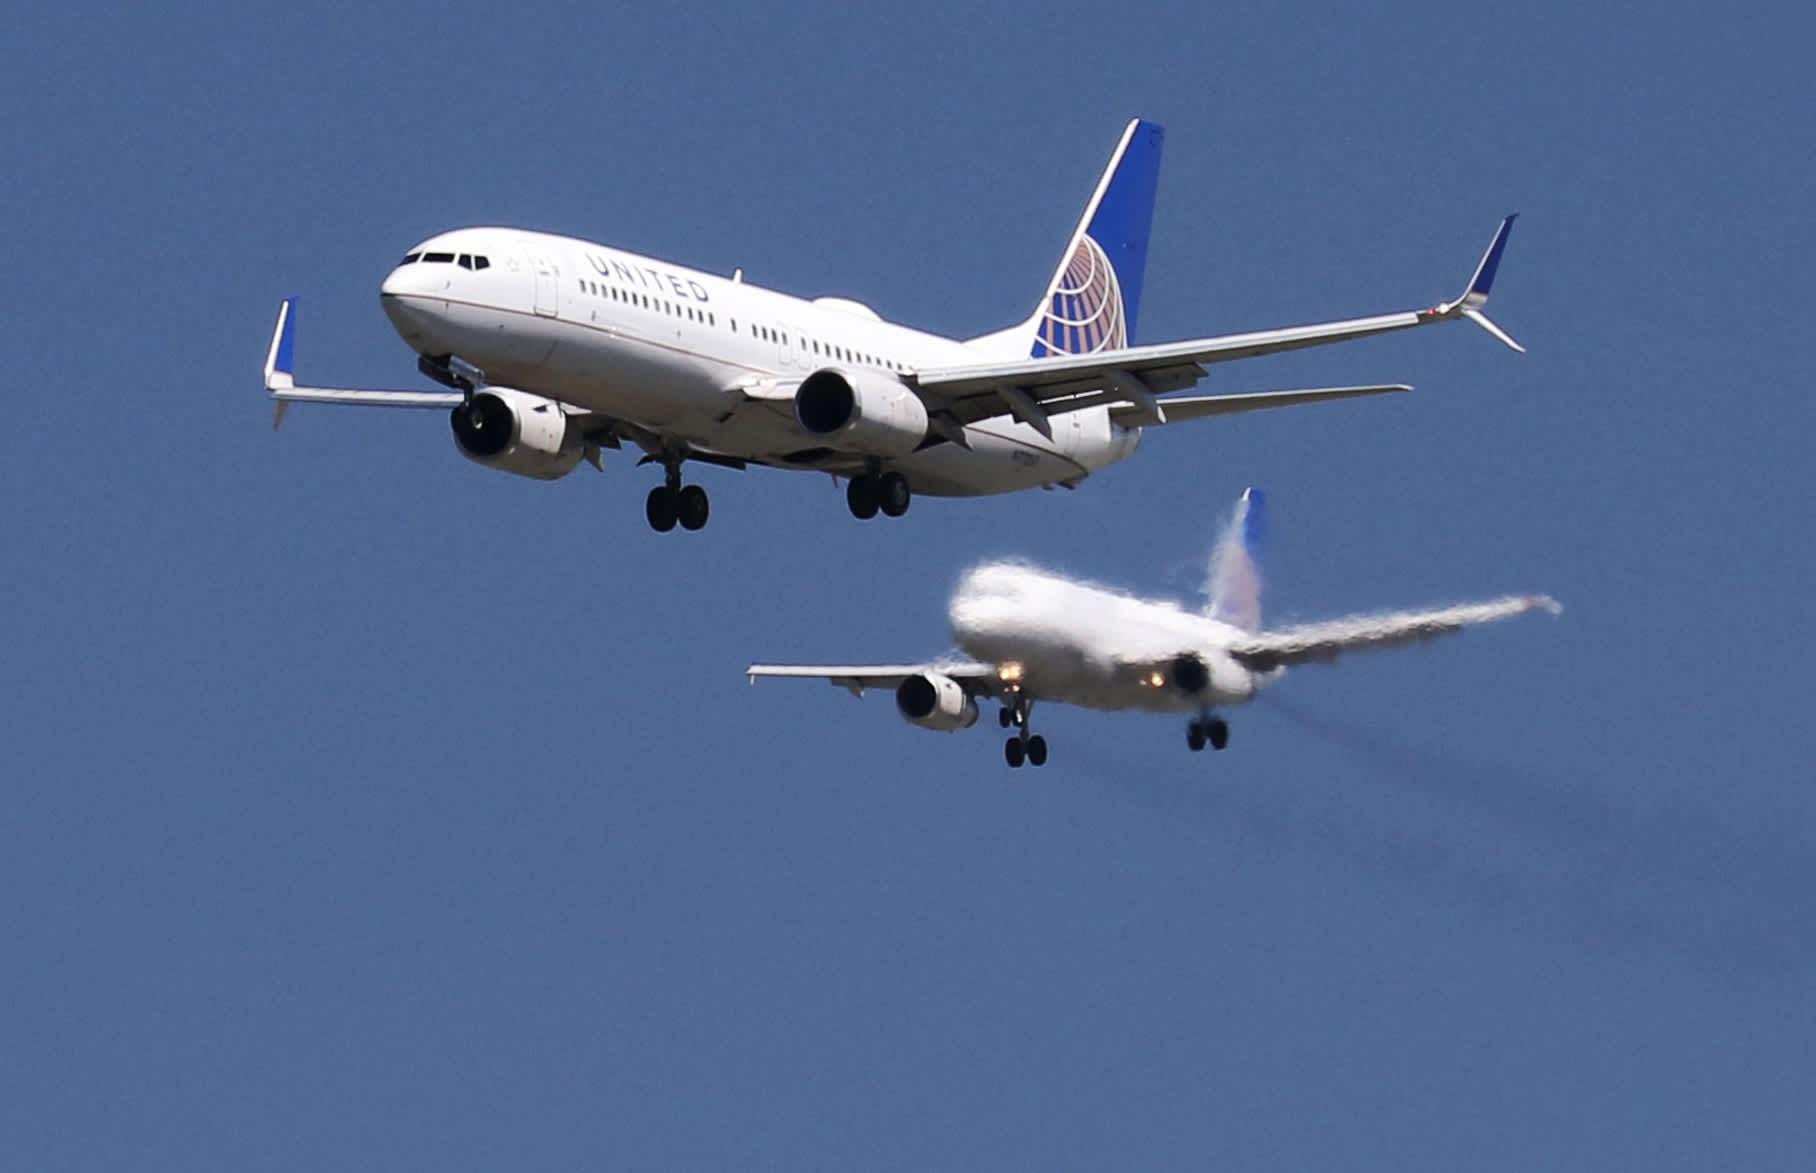 United Airlines shares rise on upbeat demand forecast despite delta variant